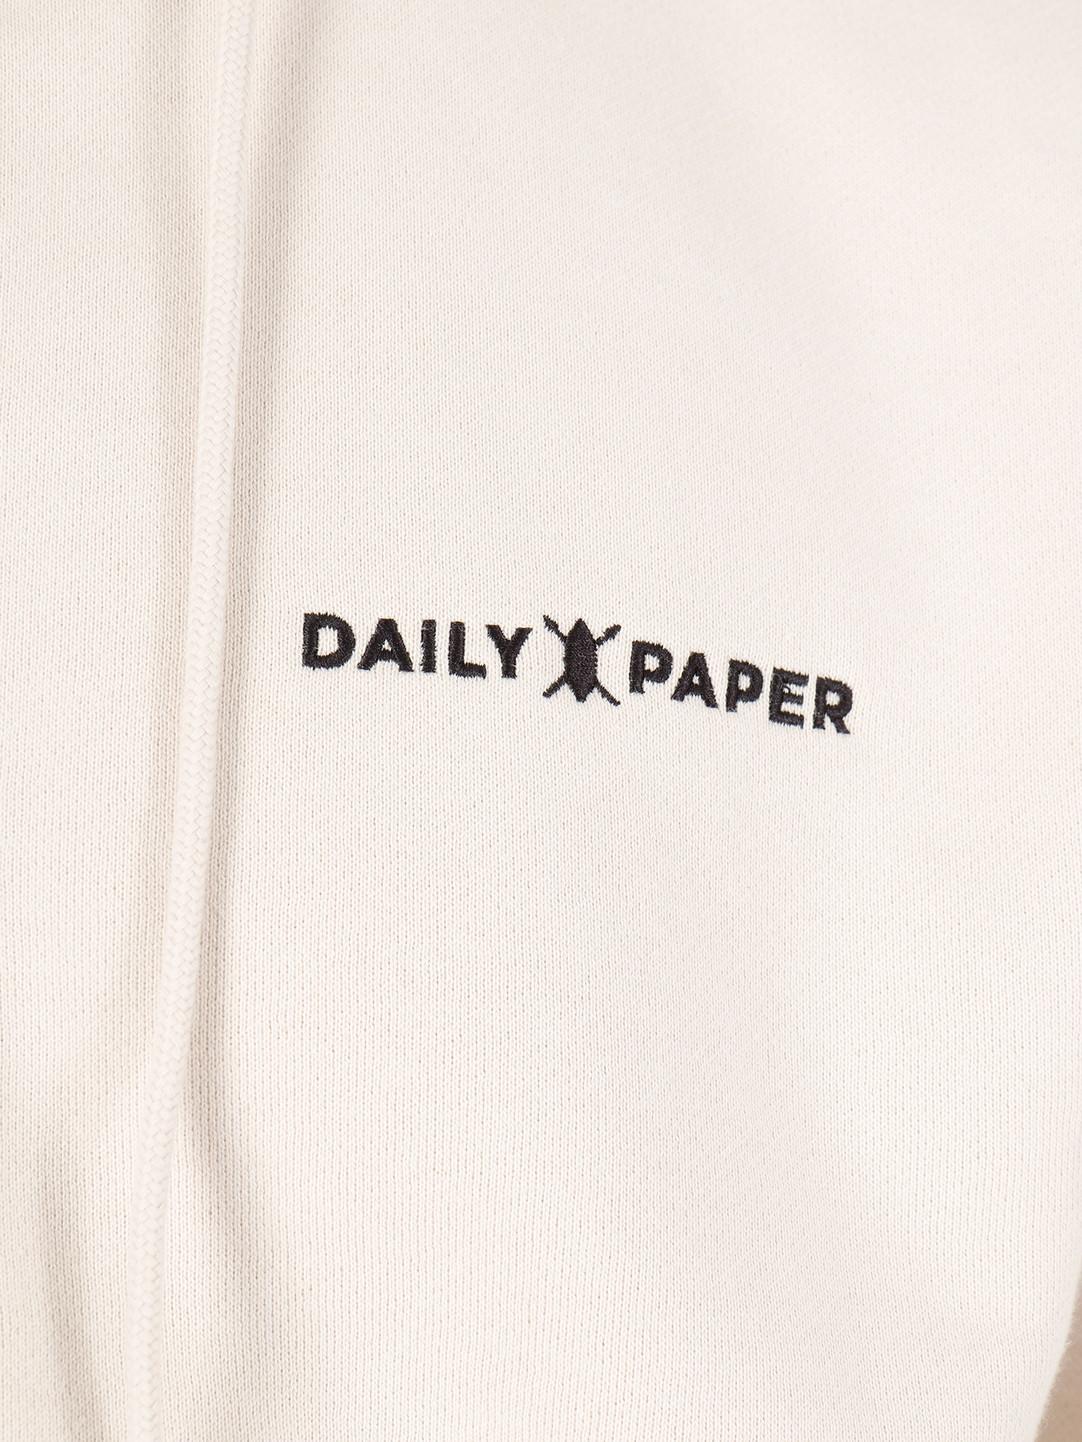 Daily Paper Daily Paper Shield Logo Vest Moonbeam Beige 20E1HD02-02